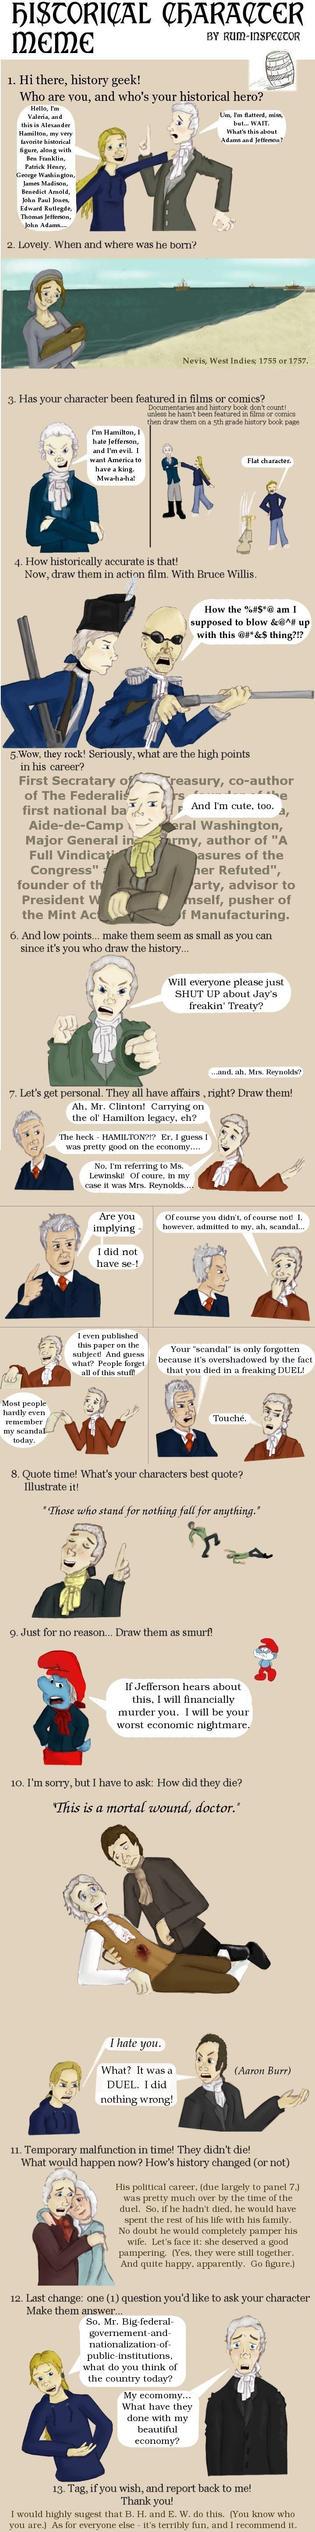 Historical Meme- Hamilton by ThisBirdTooHasFlown